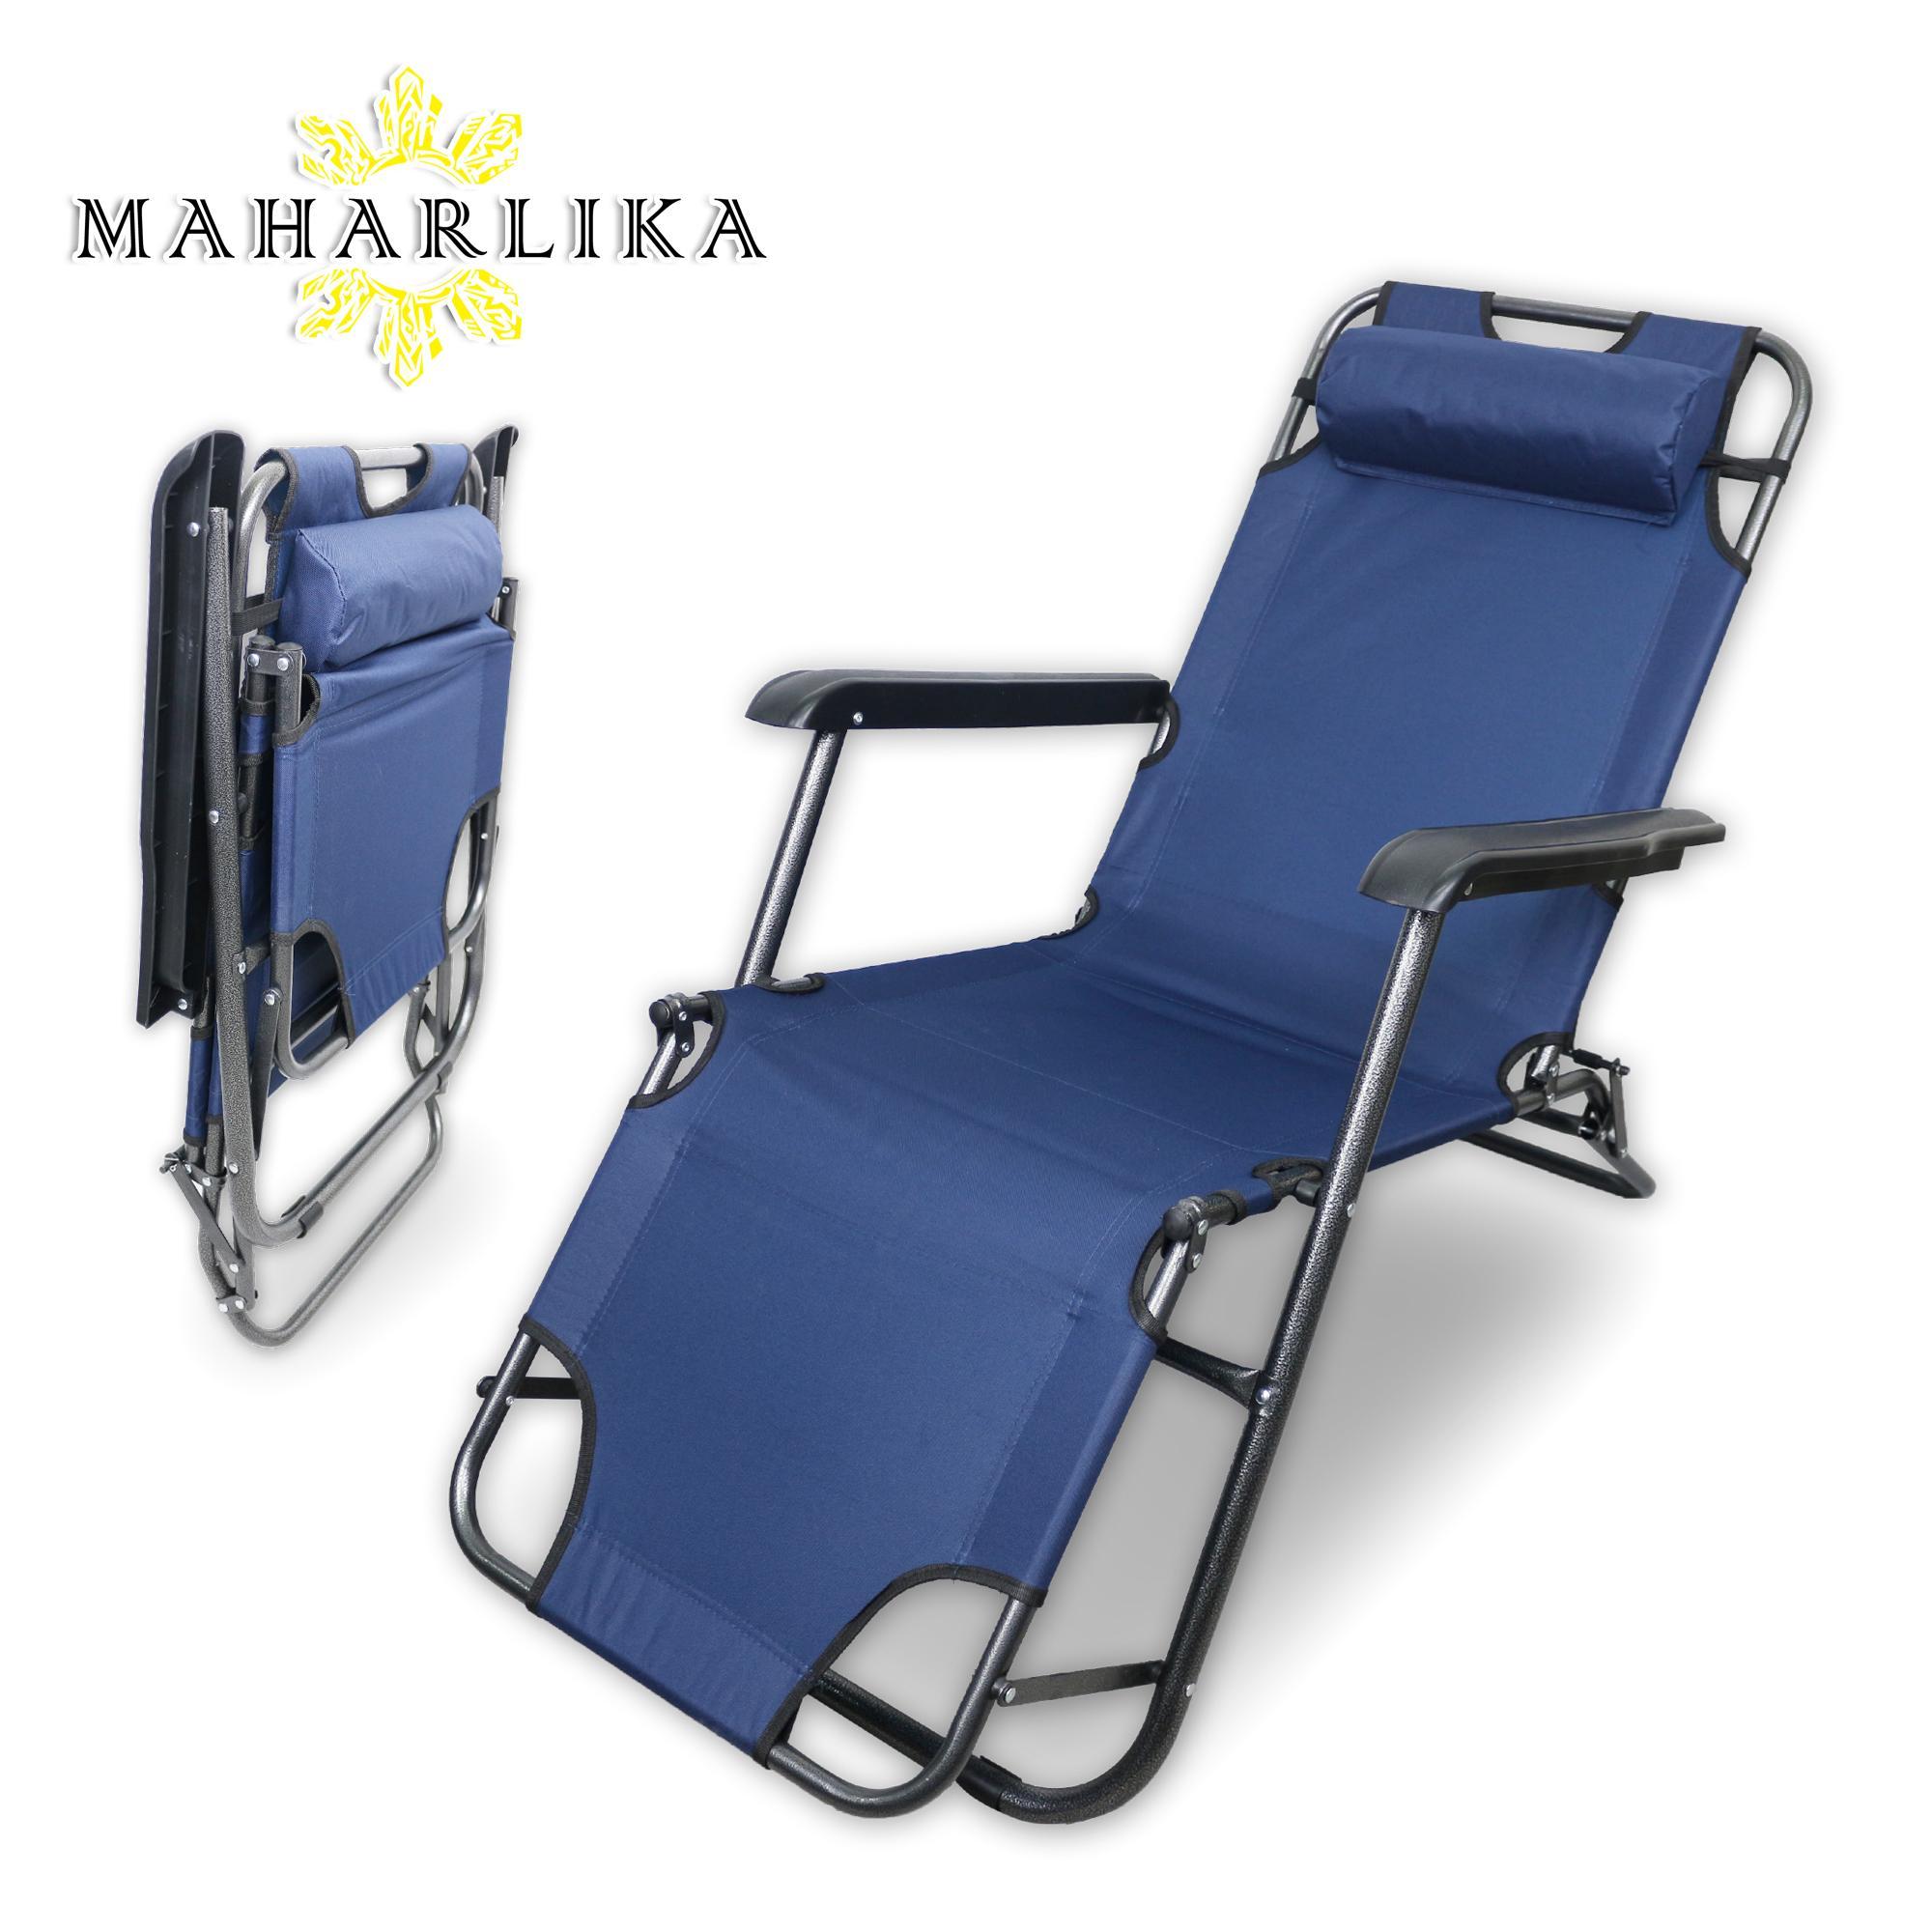 Kloken Zero Gravity Comfort Chair Reviews Ratings And Best